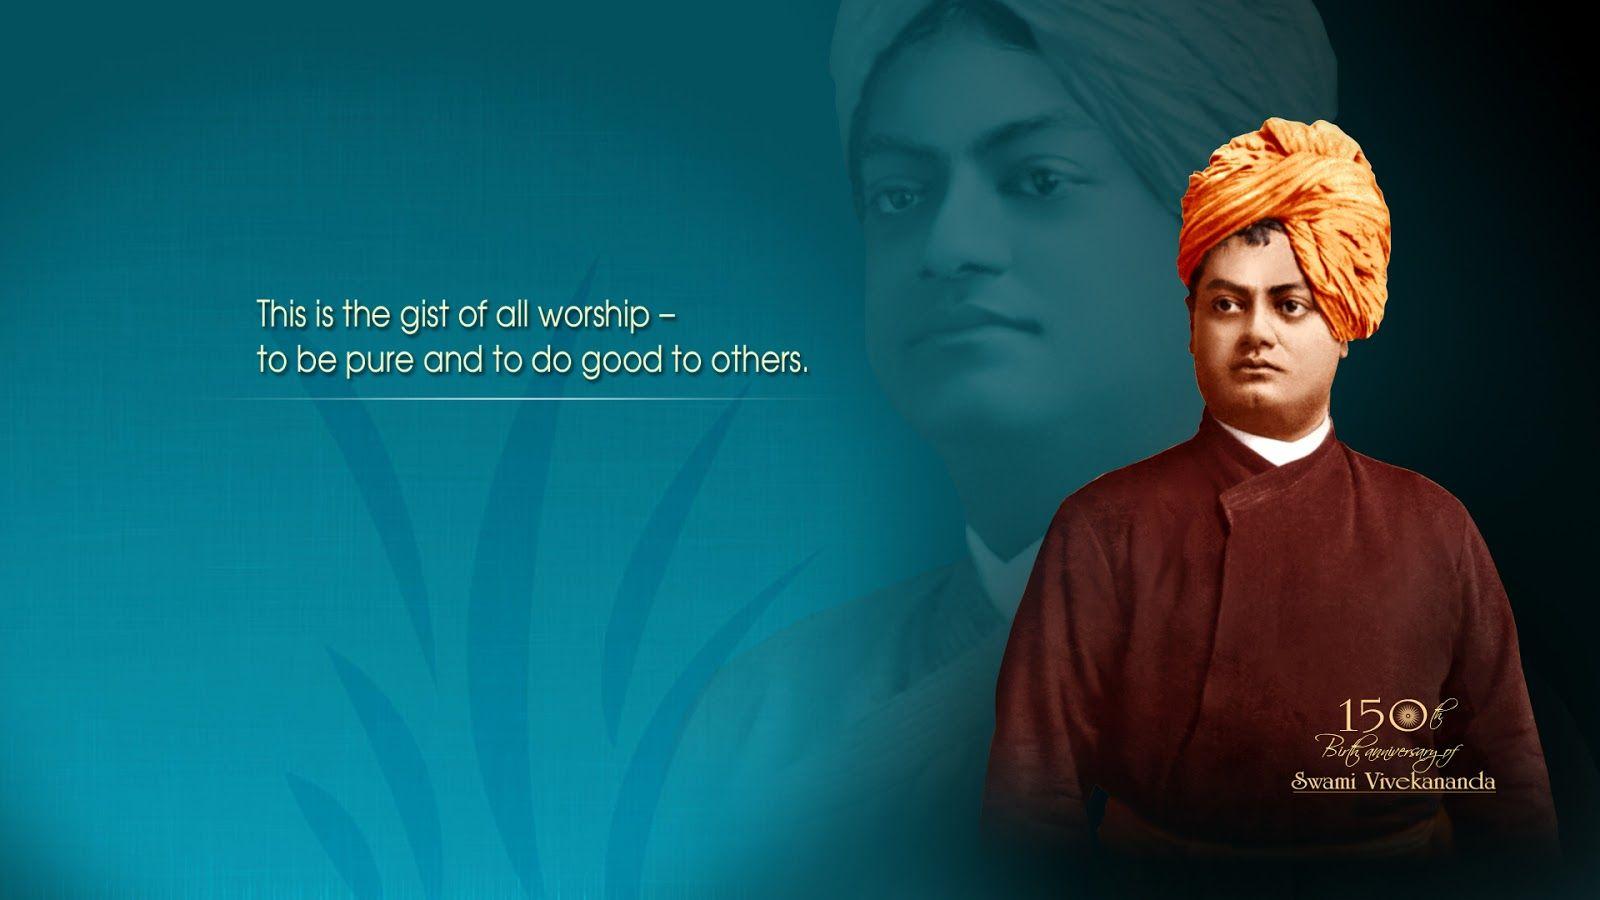 Kannada Love Quotes Wallpapers 1366x768 Swami Vivekananda Hd Wallpapers Download